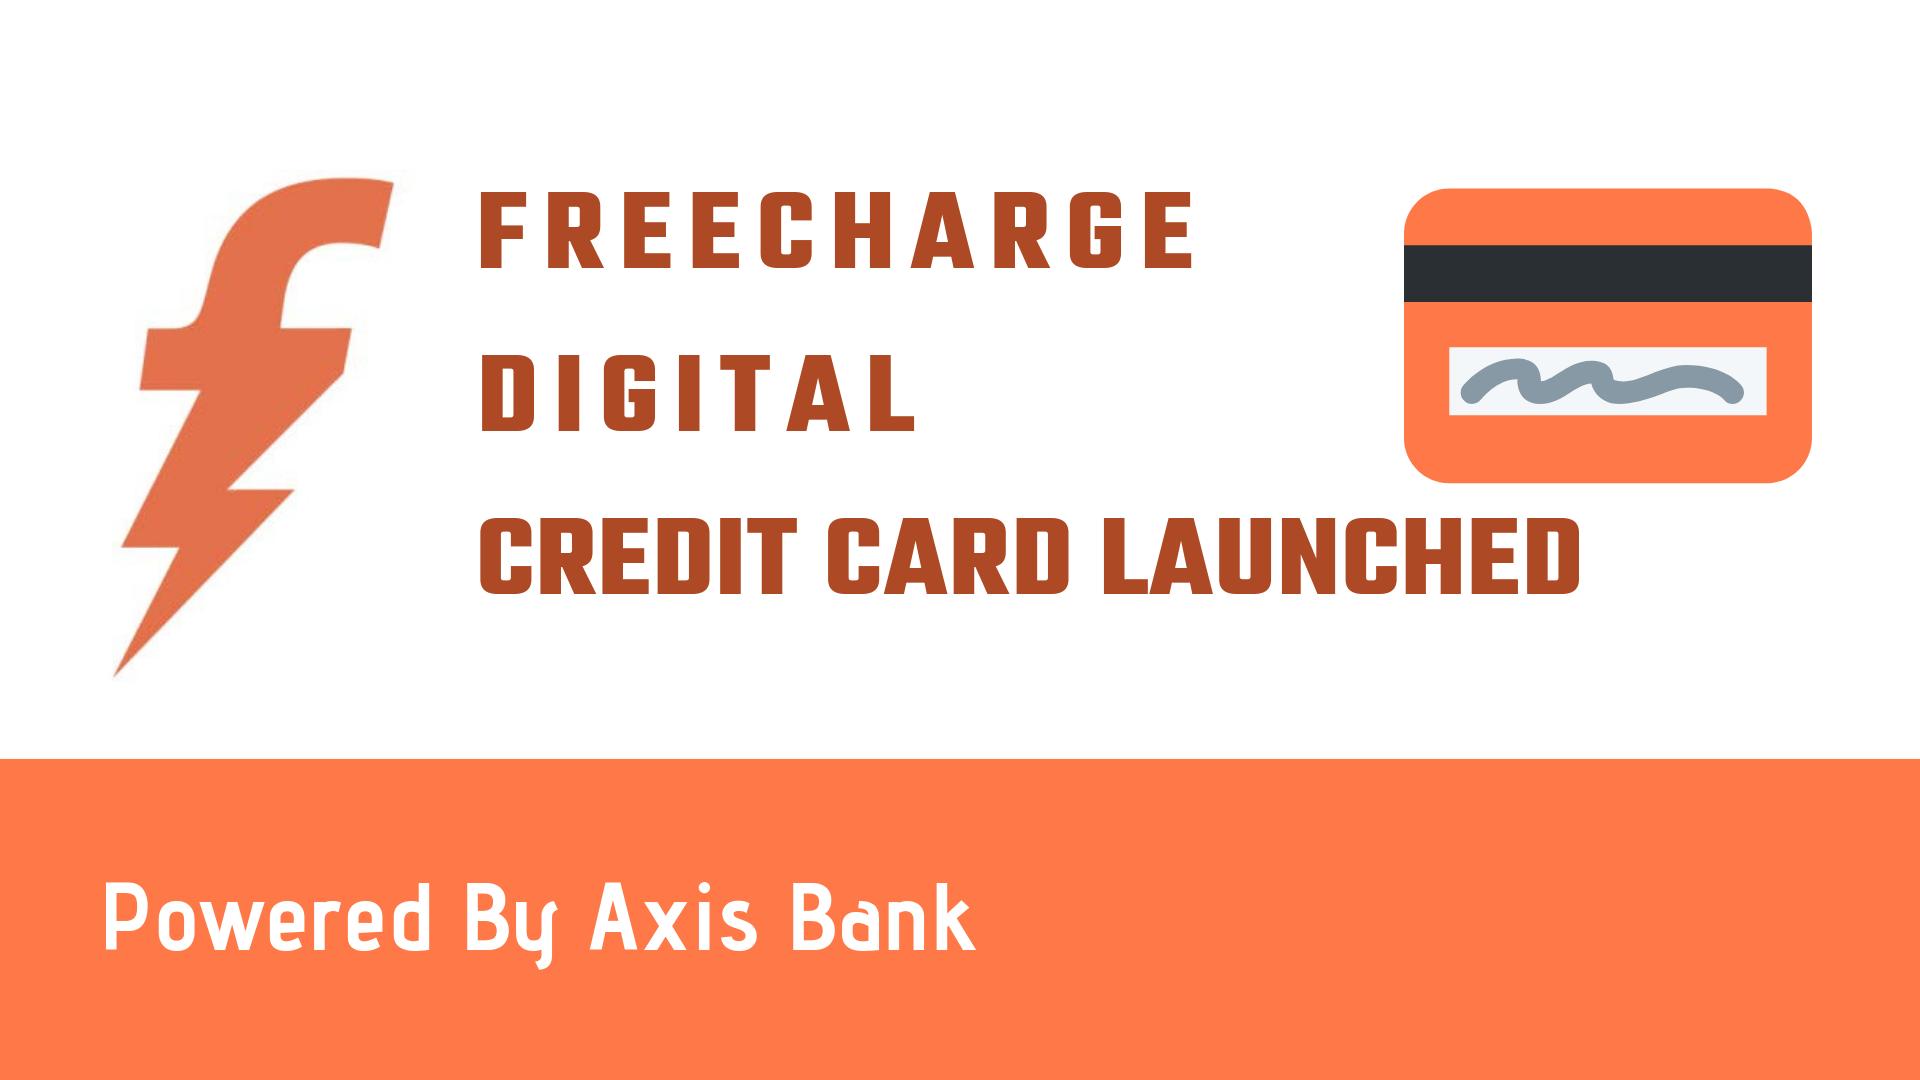 freecharge-digital-credit-card